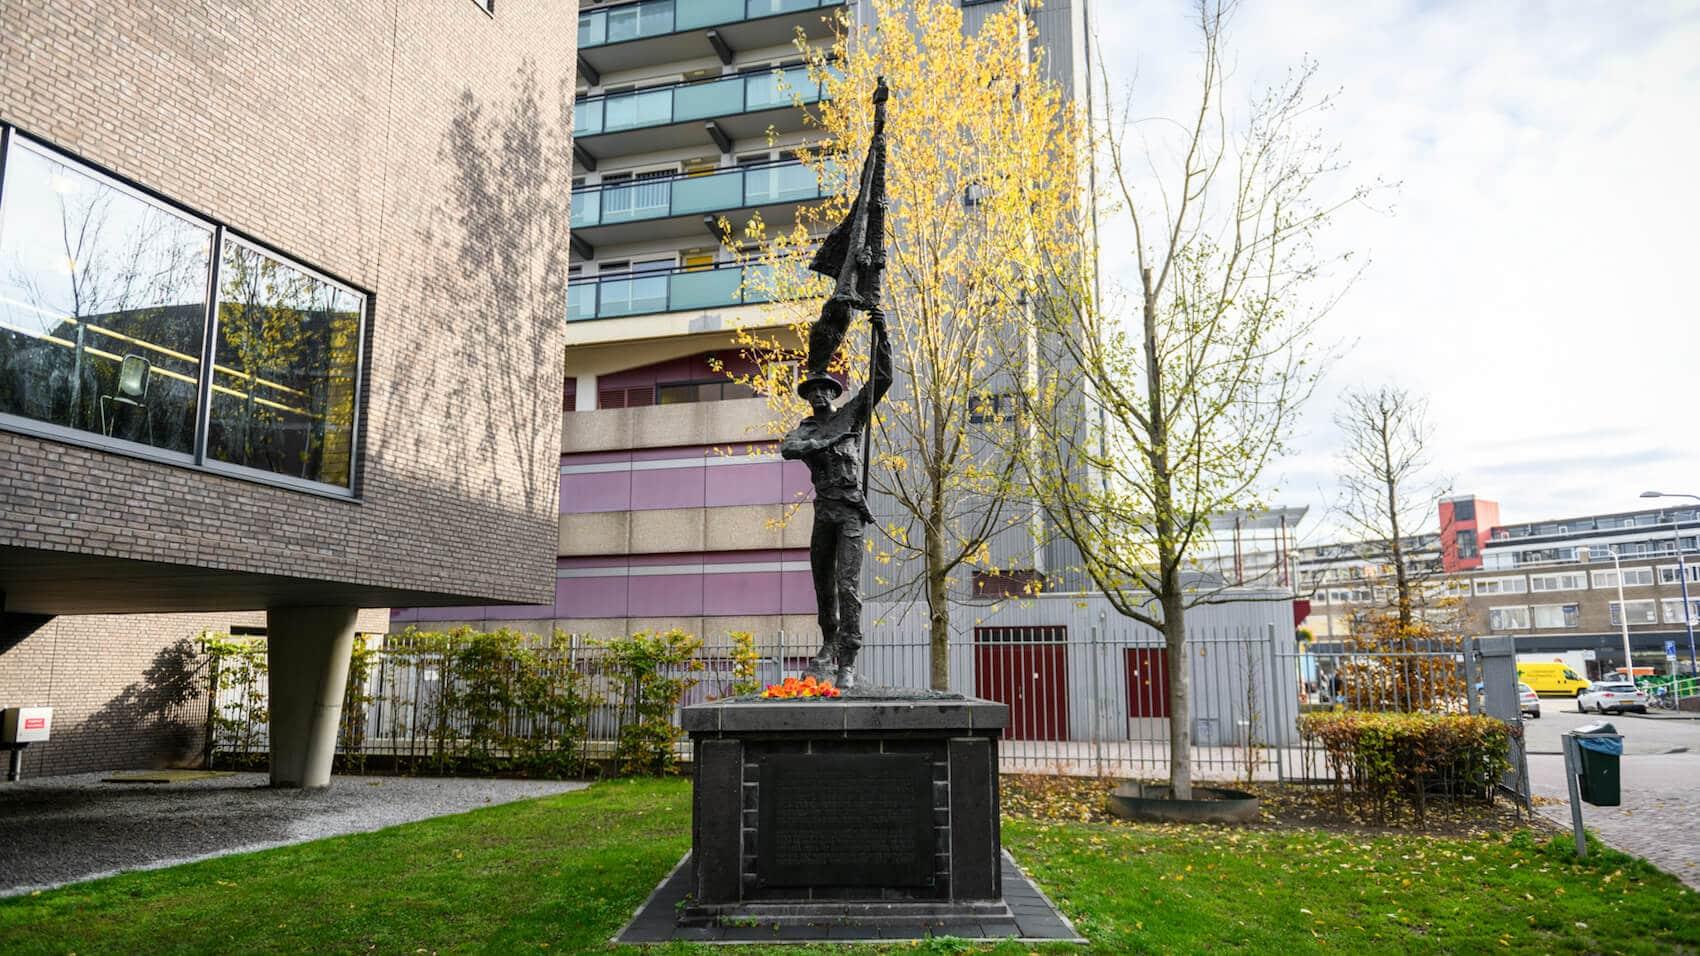 Monument Koninklijke Nederlandse Brigade 'Prinses Irene'